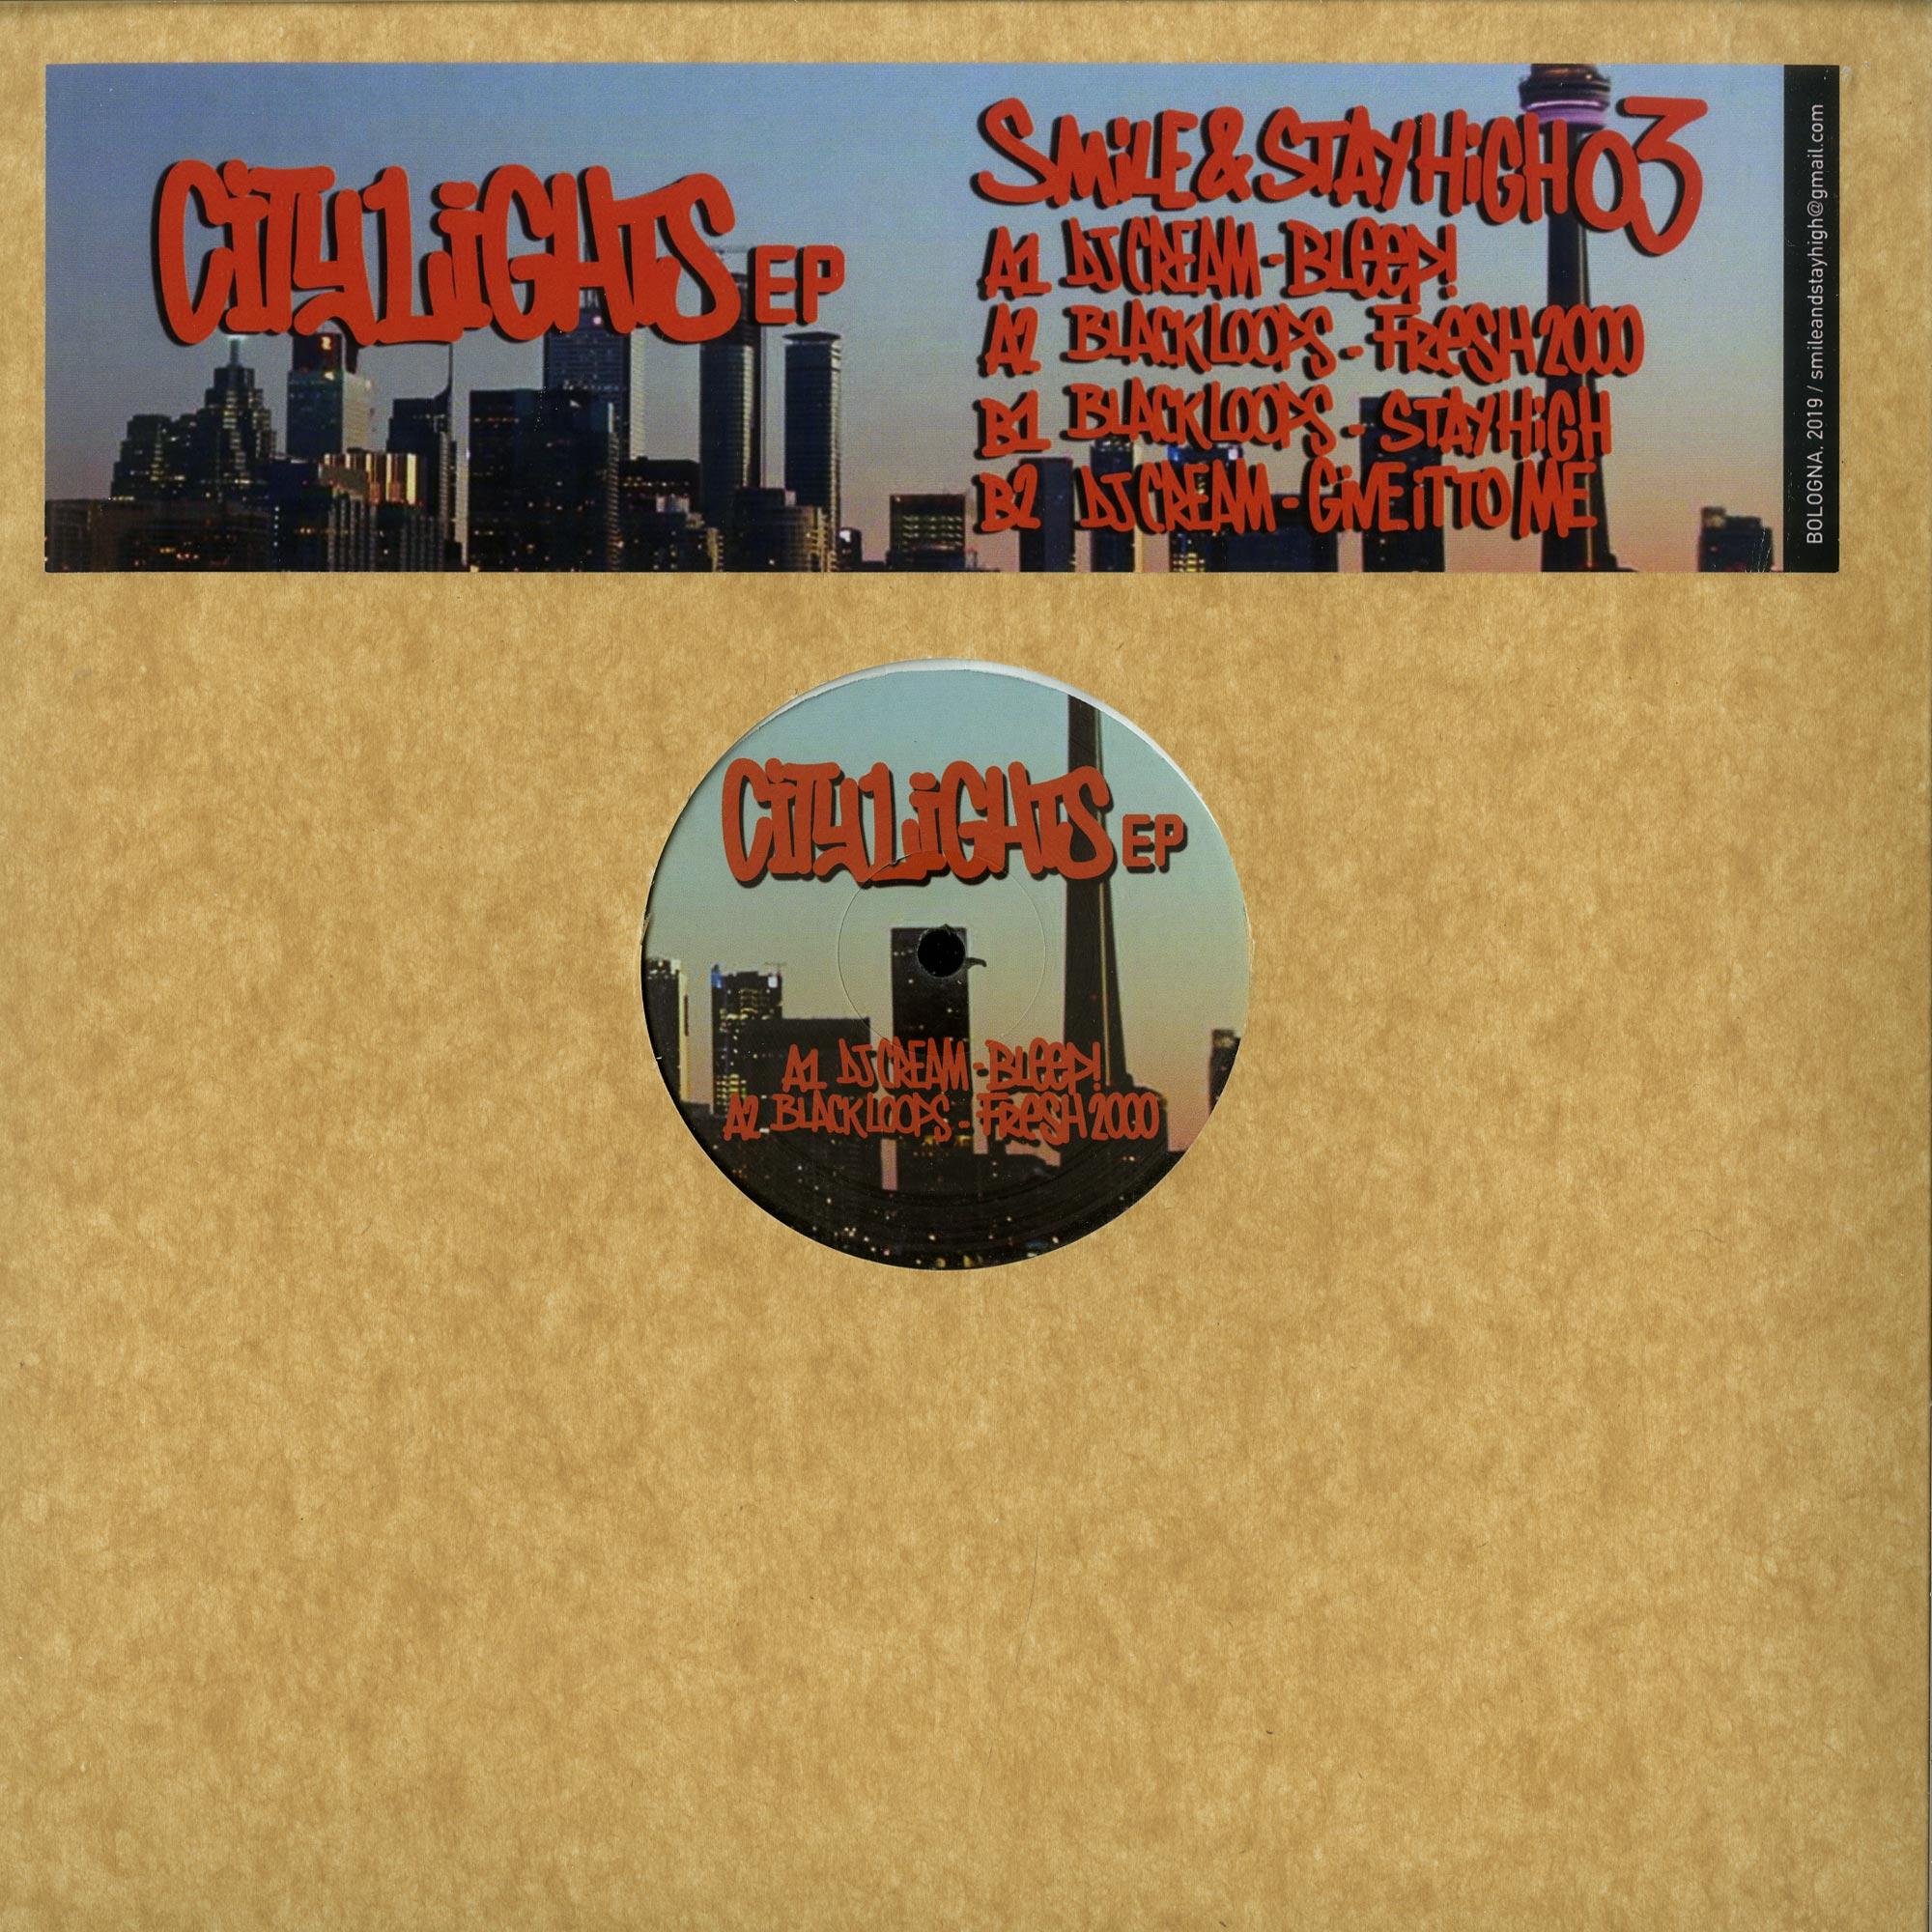 DJ Cream / Black Loops - CITY LIGHTS EP